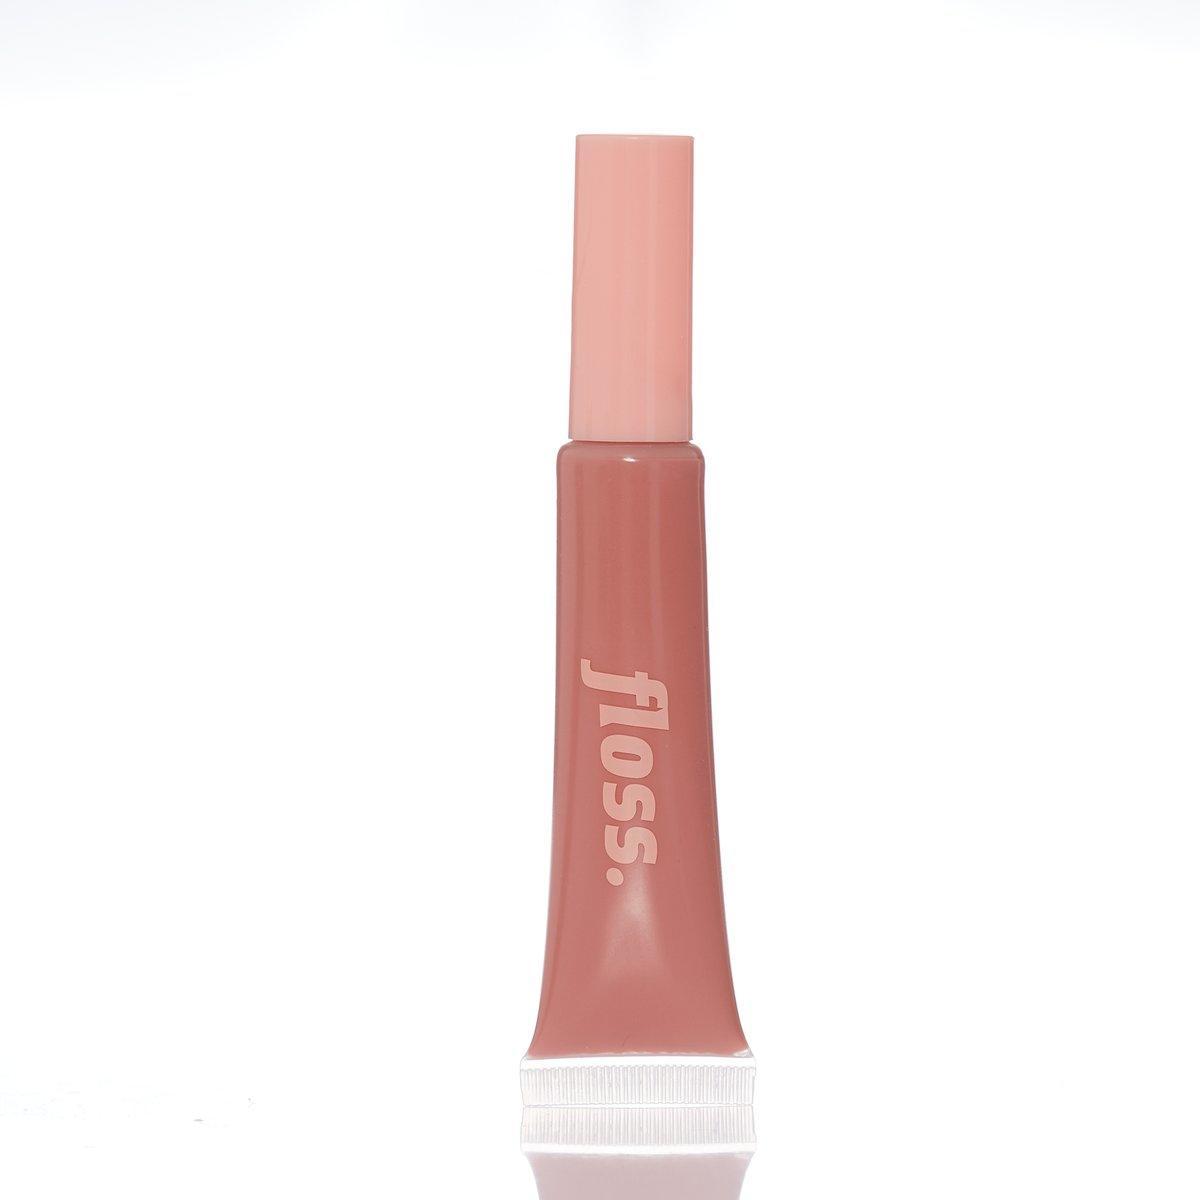 Floss My New Favorites Lip Gloss LAX